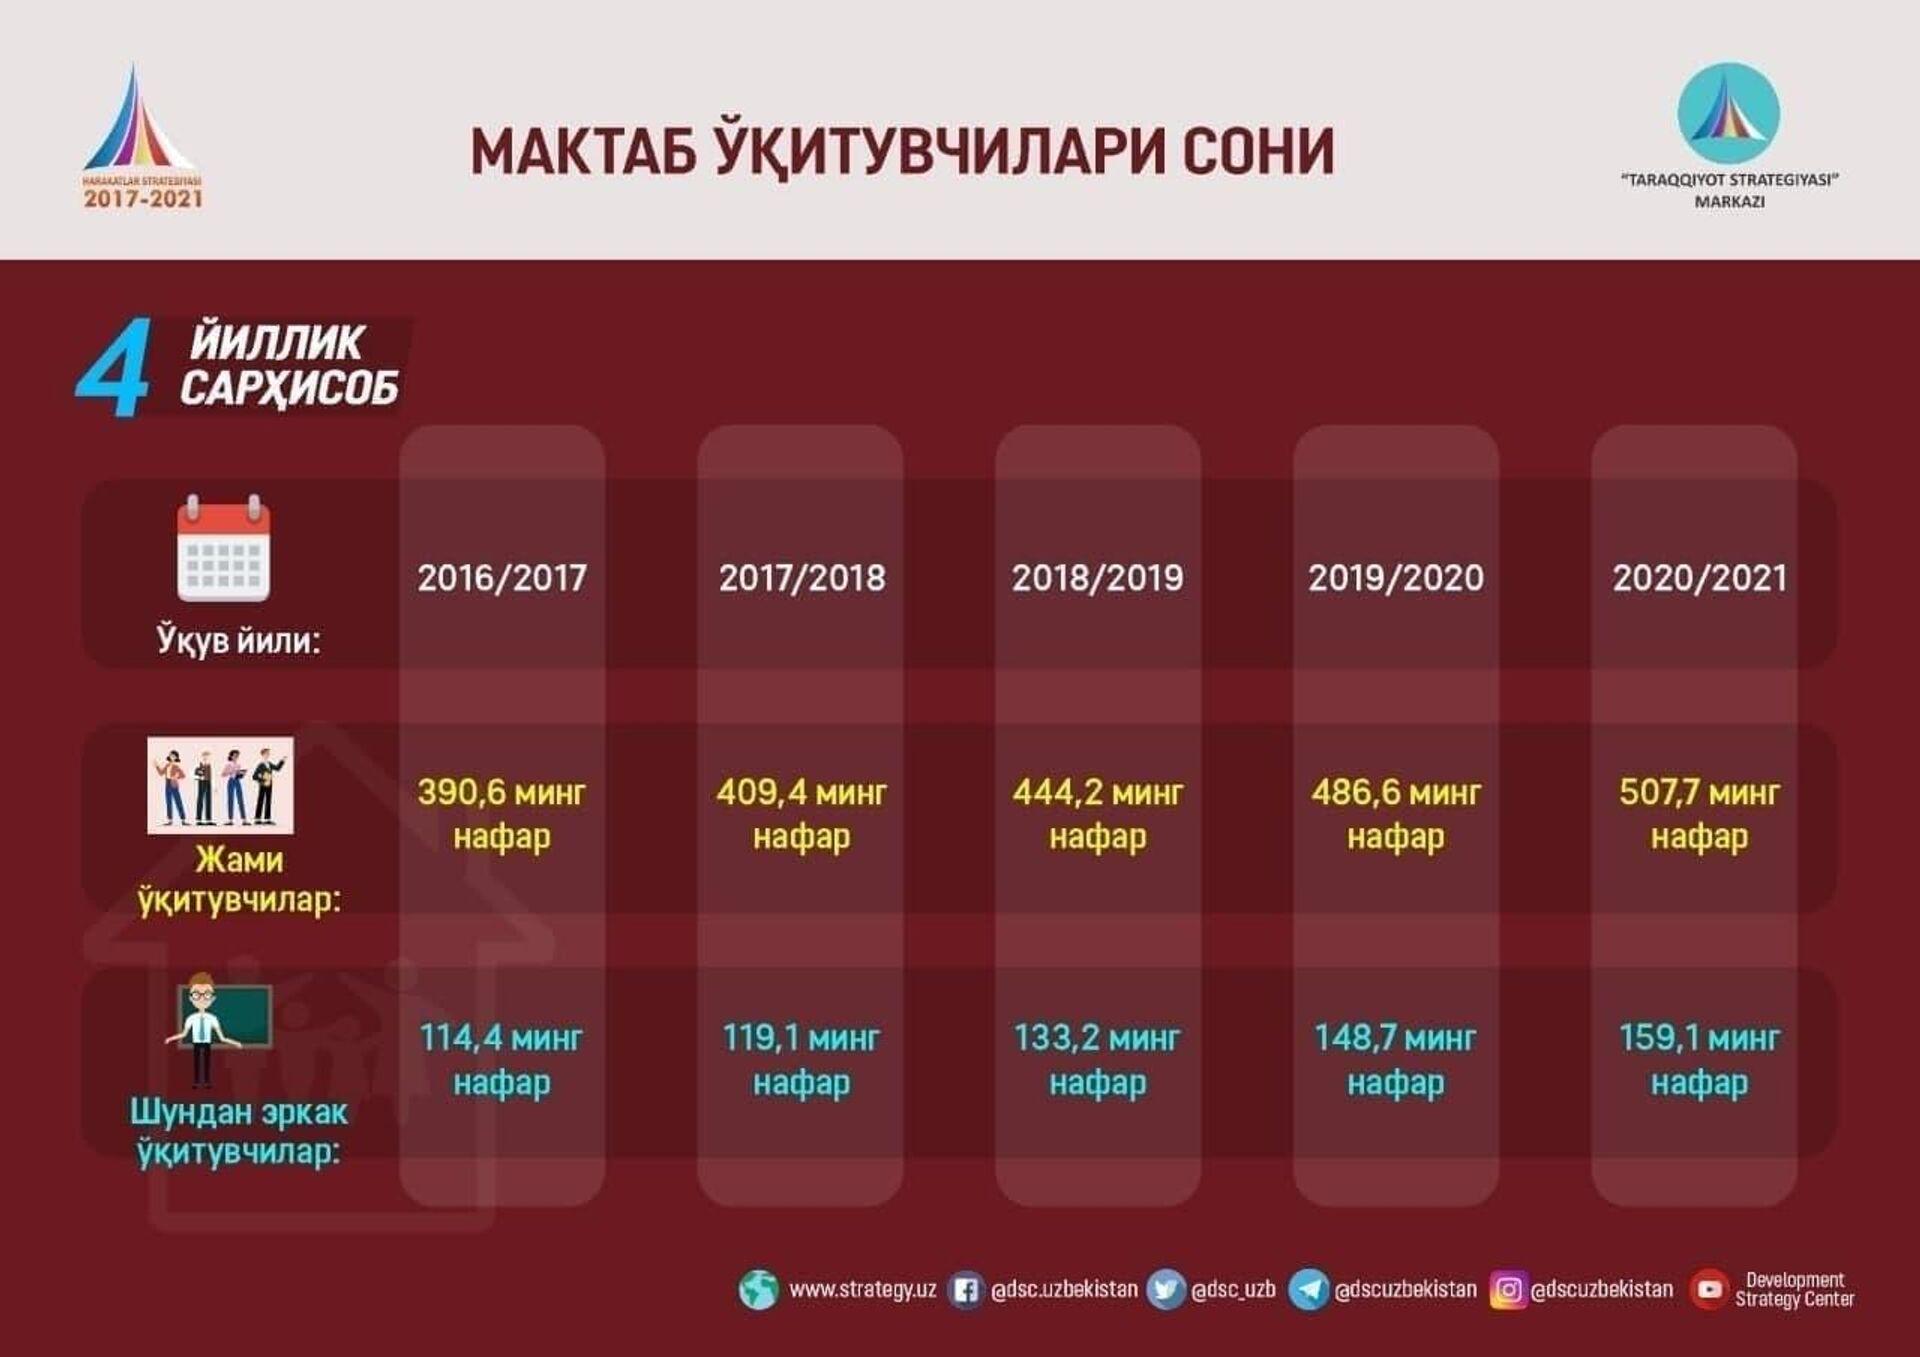 Мактаб ўқитувчилари сони  - Sputnik Ўзбекистон, 1920, 31.08.2021